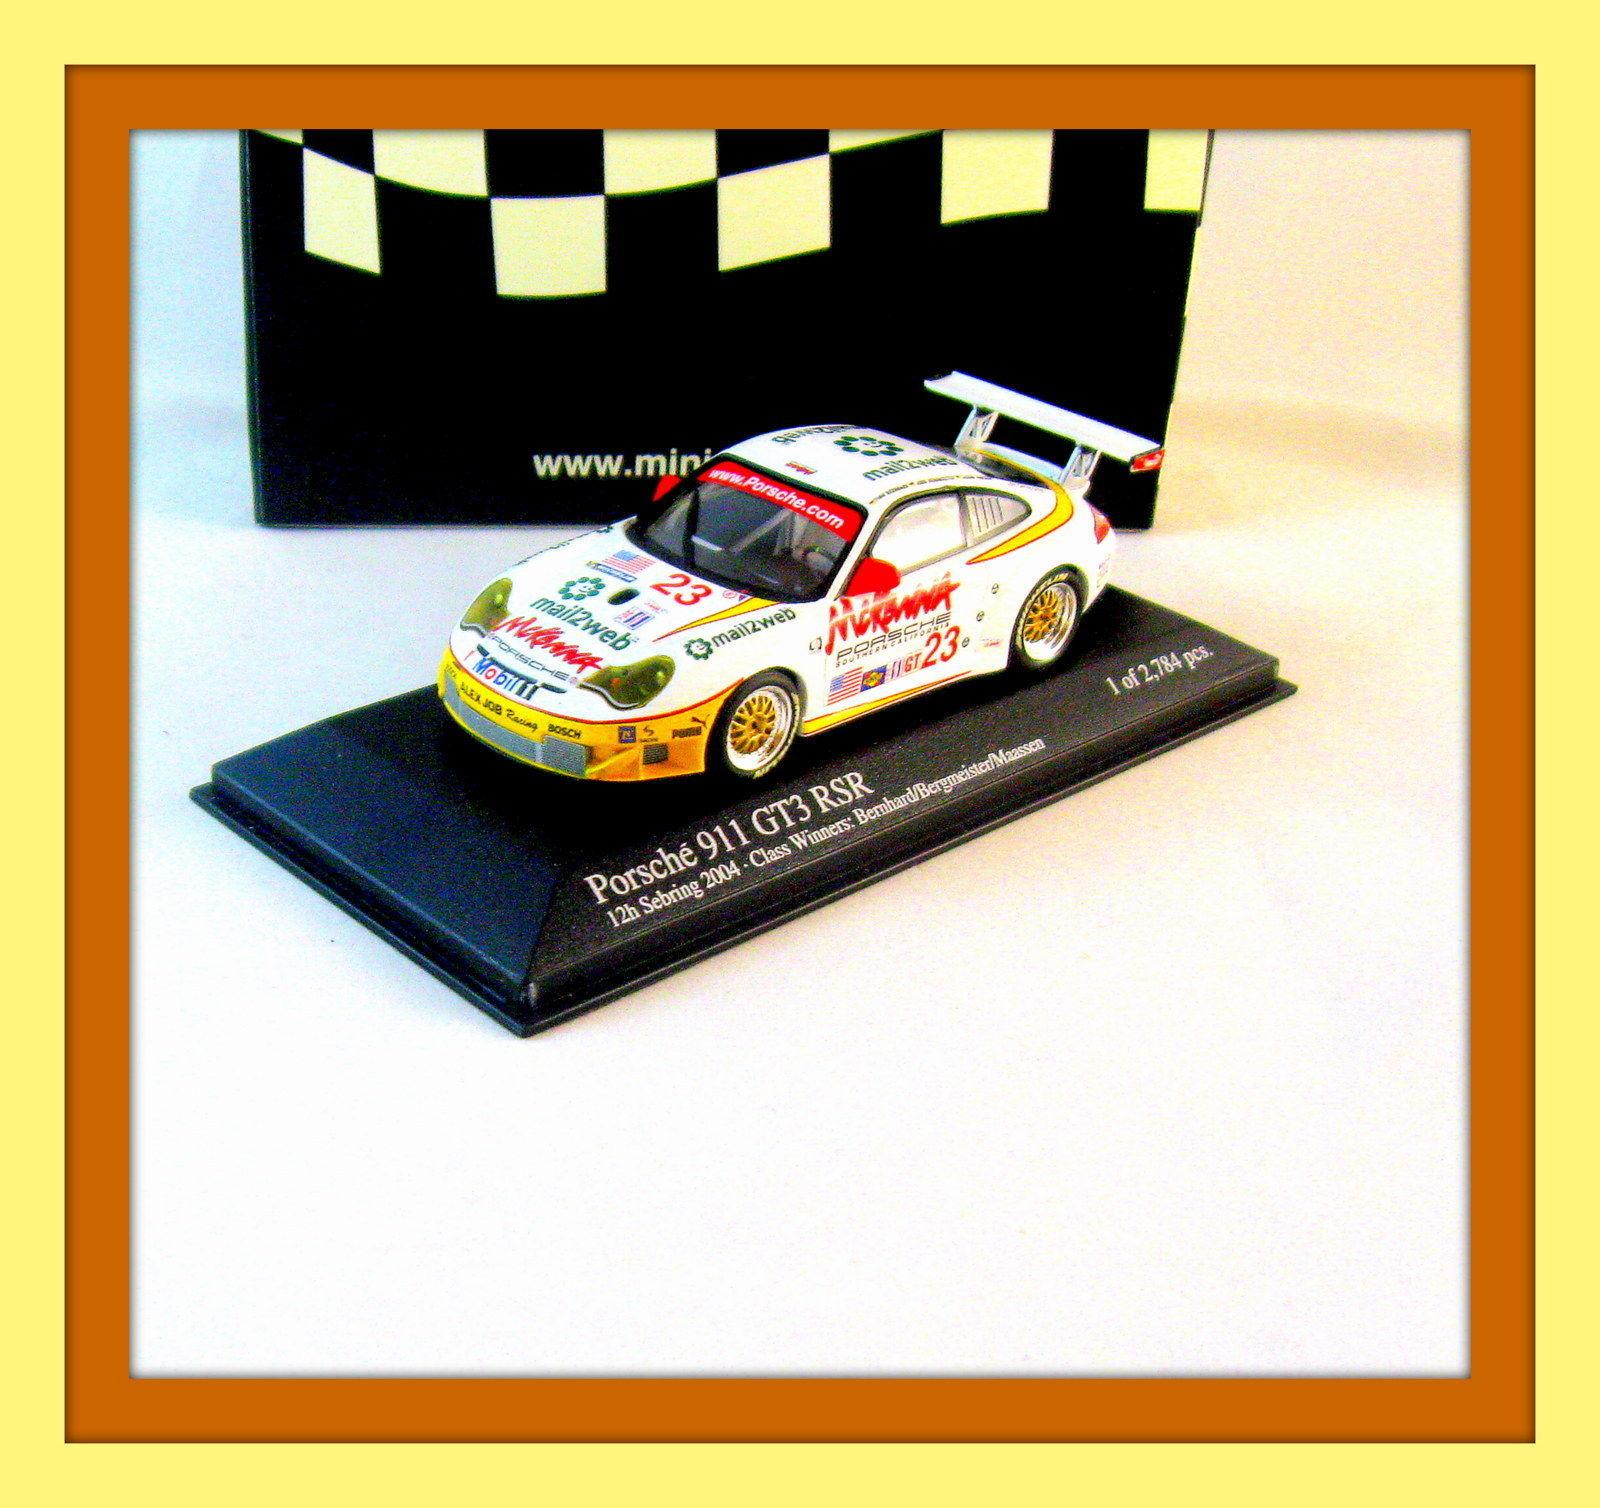 PORSCHE 911 GT3-RSR 12h SEBRING 2004 ,LIMITED EDITION,MINICHAMPS 1/43 MODEL,NEW - $44.09